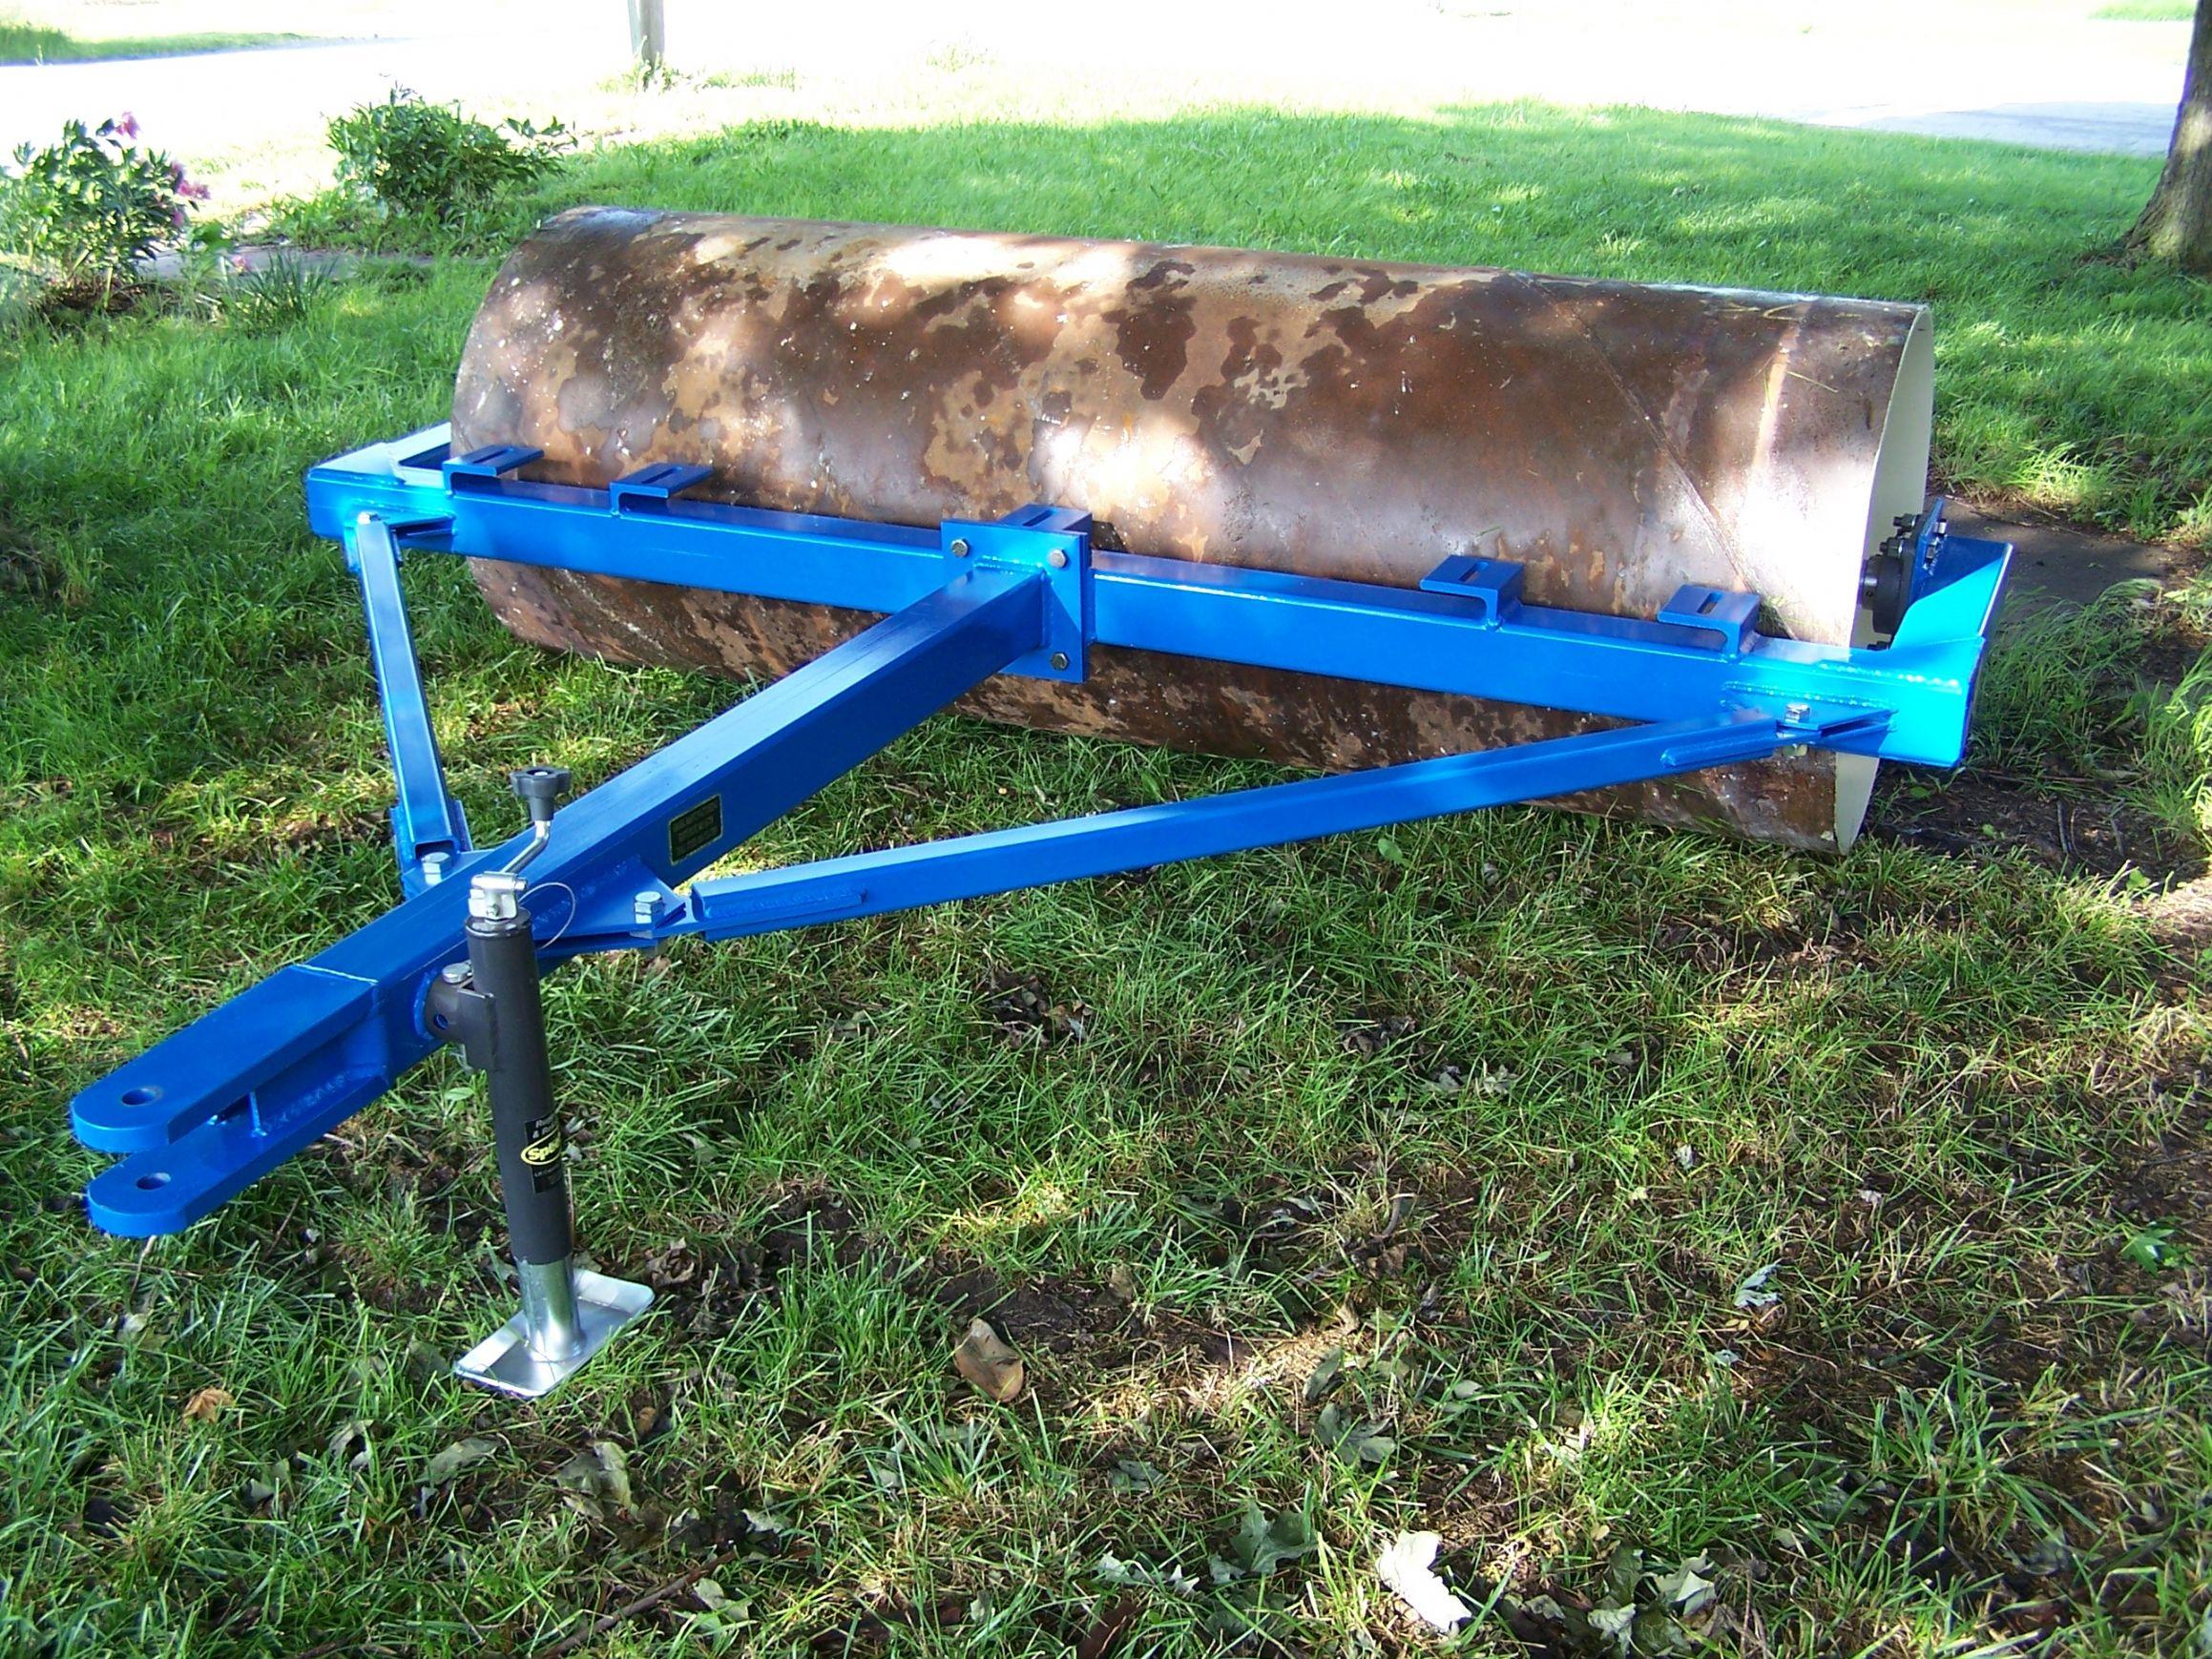 field rollers large 3 pt feature grahl manufacturing. Black Bedroom Furniture Sets. Home Design Ideas